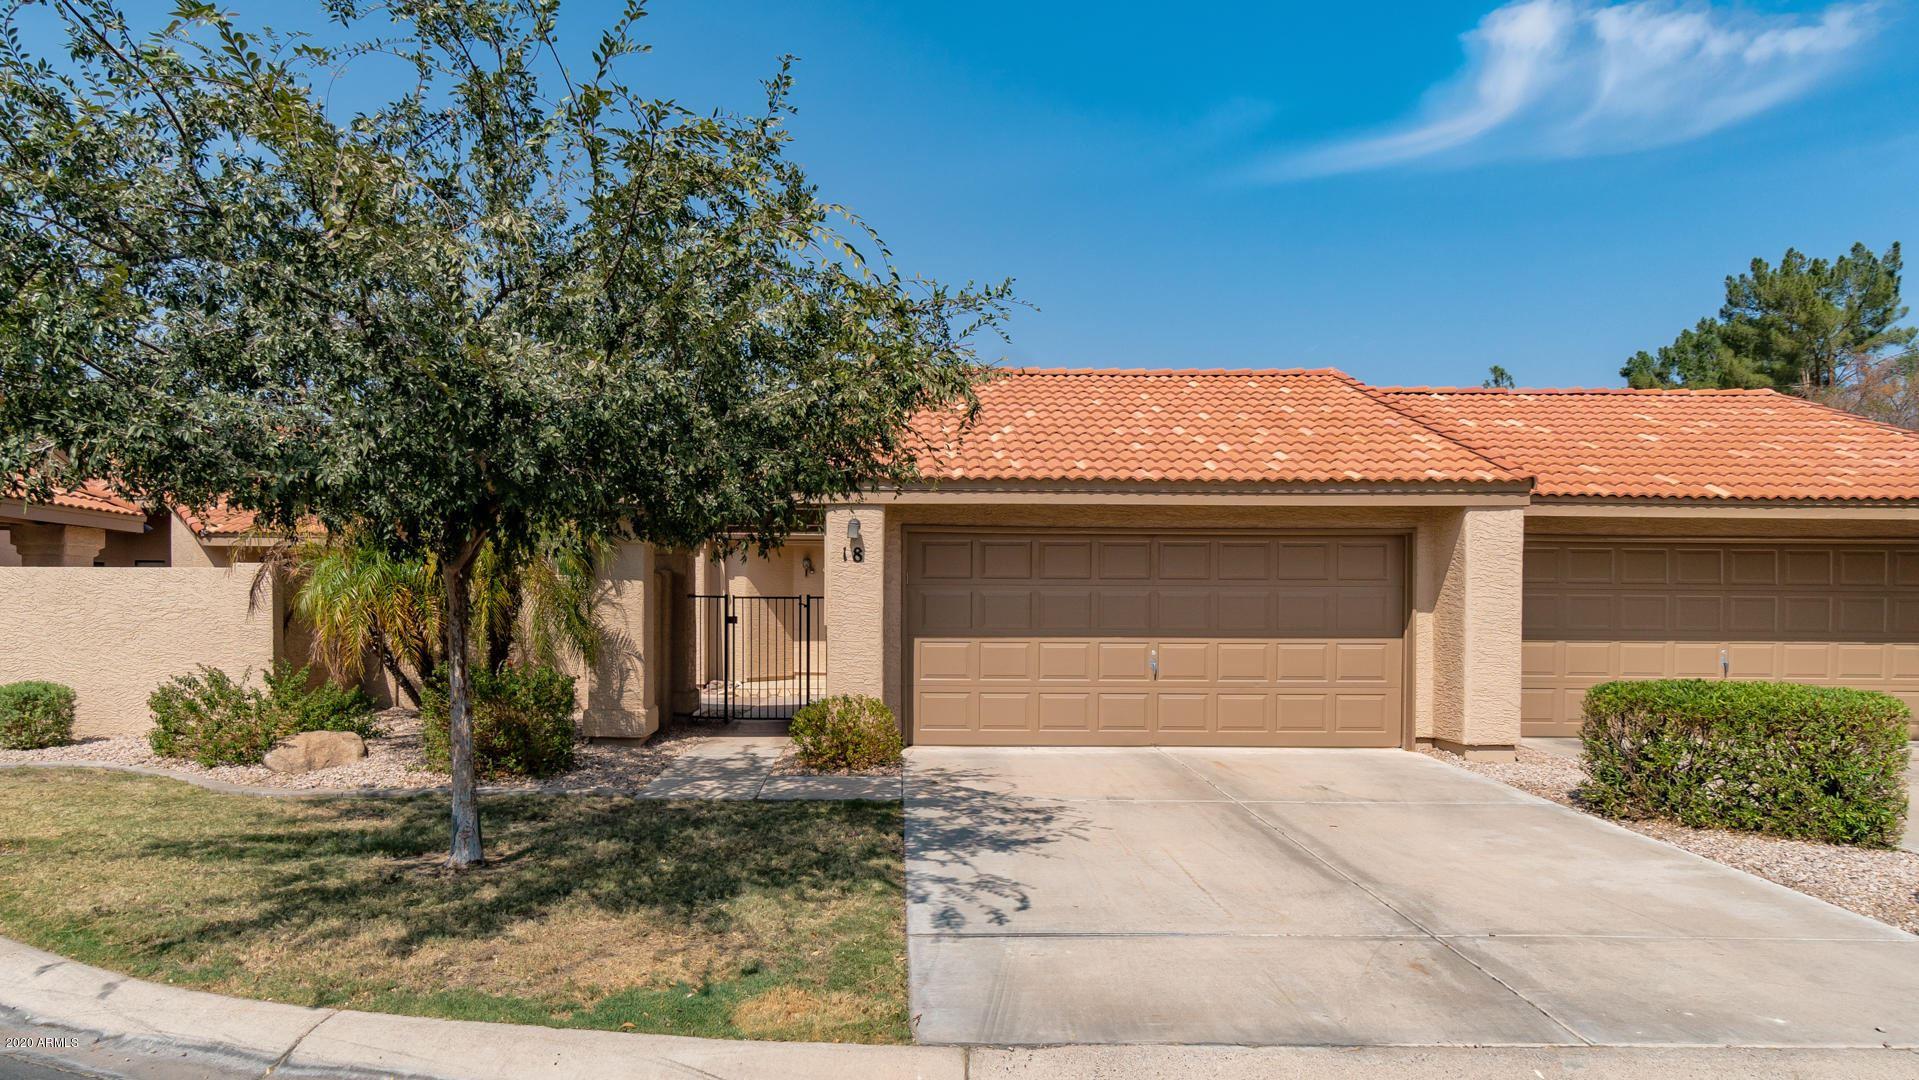 945 N PASADENA -- #18, Mesa, AZ 85201 - MLS#: 6137047